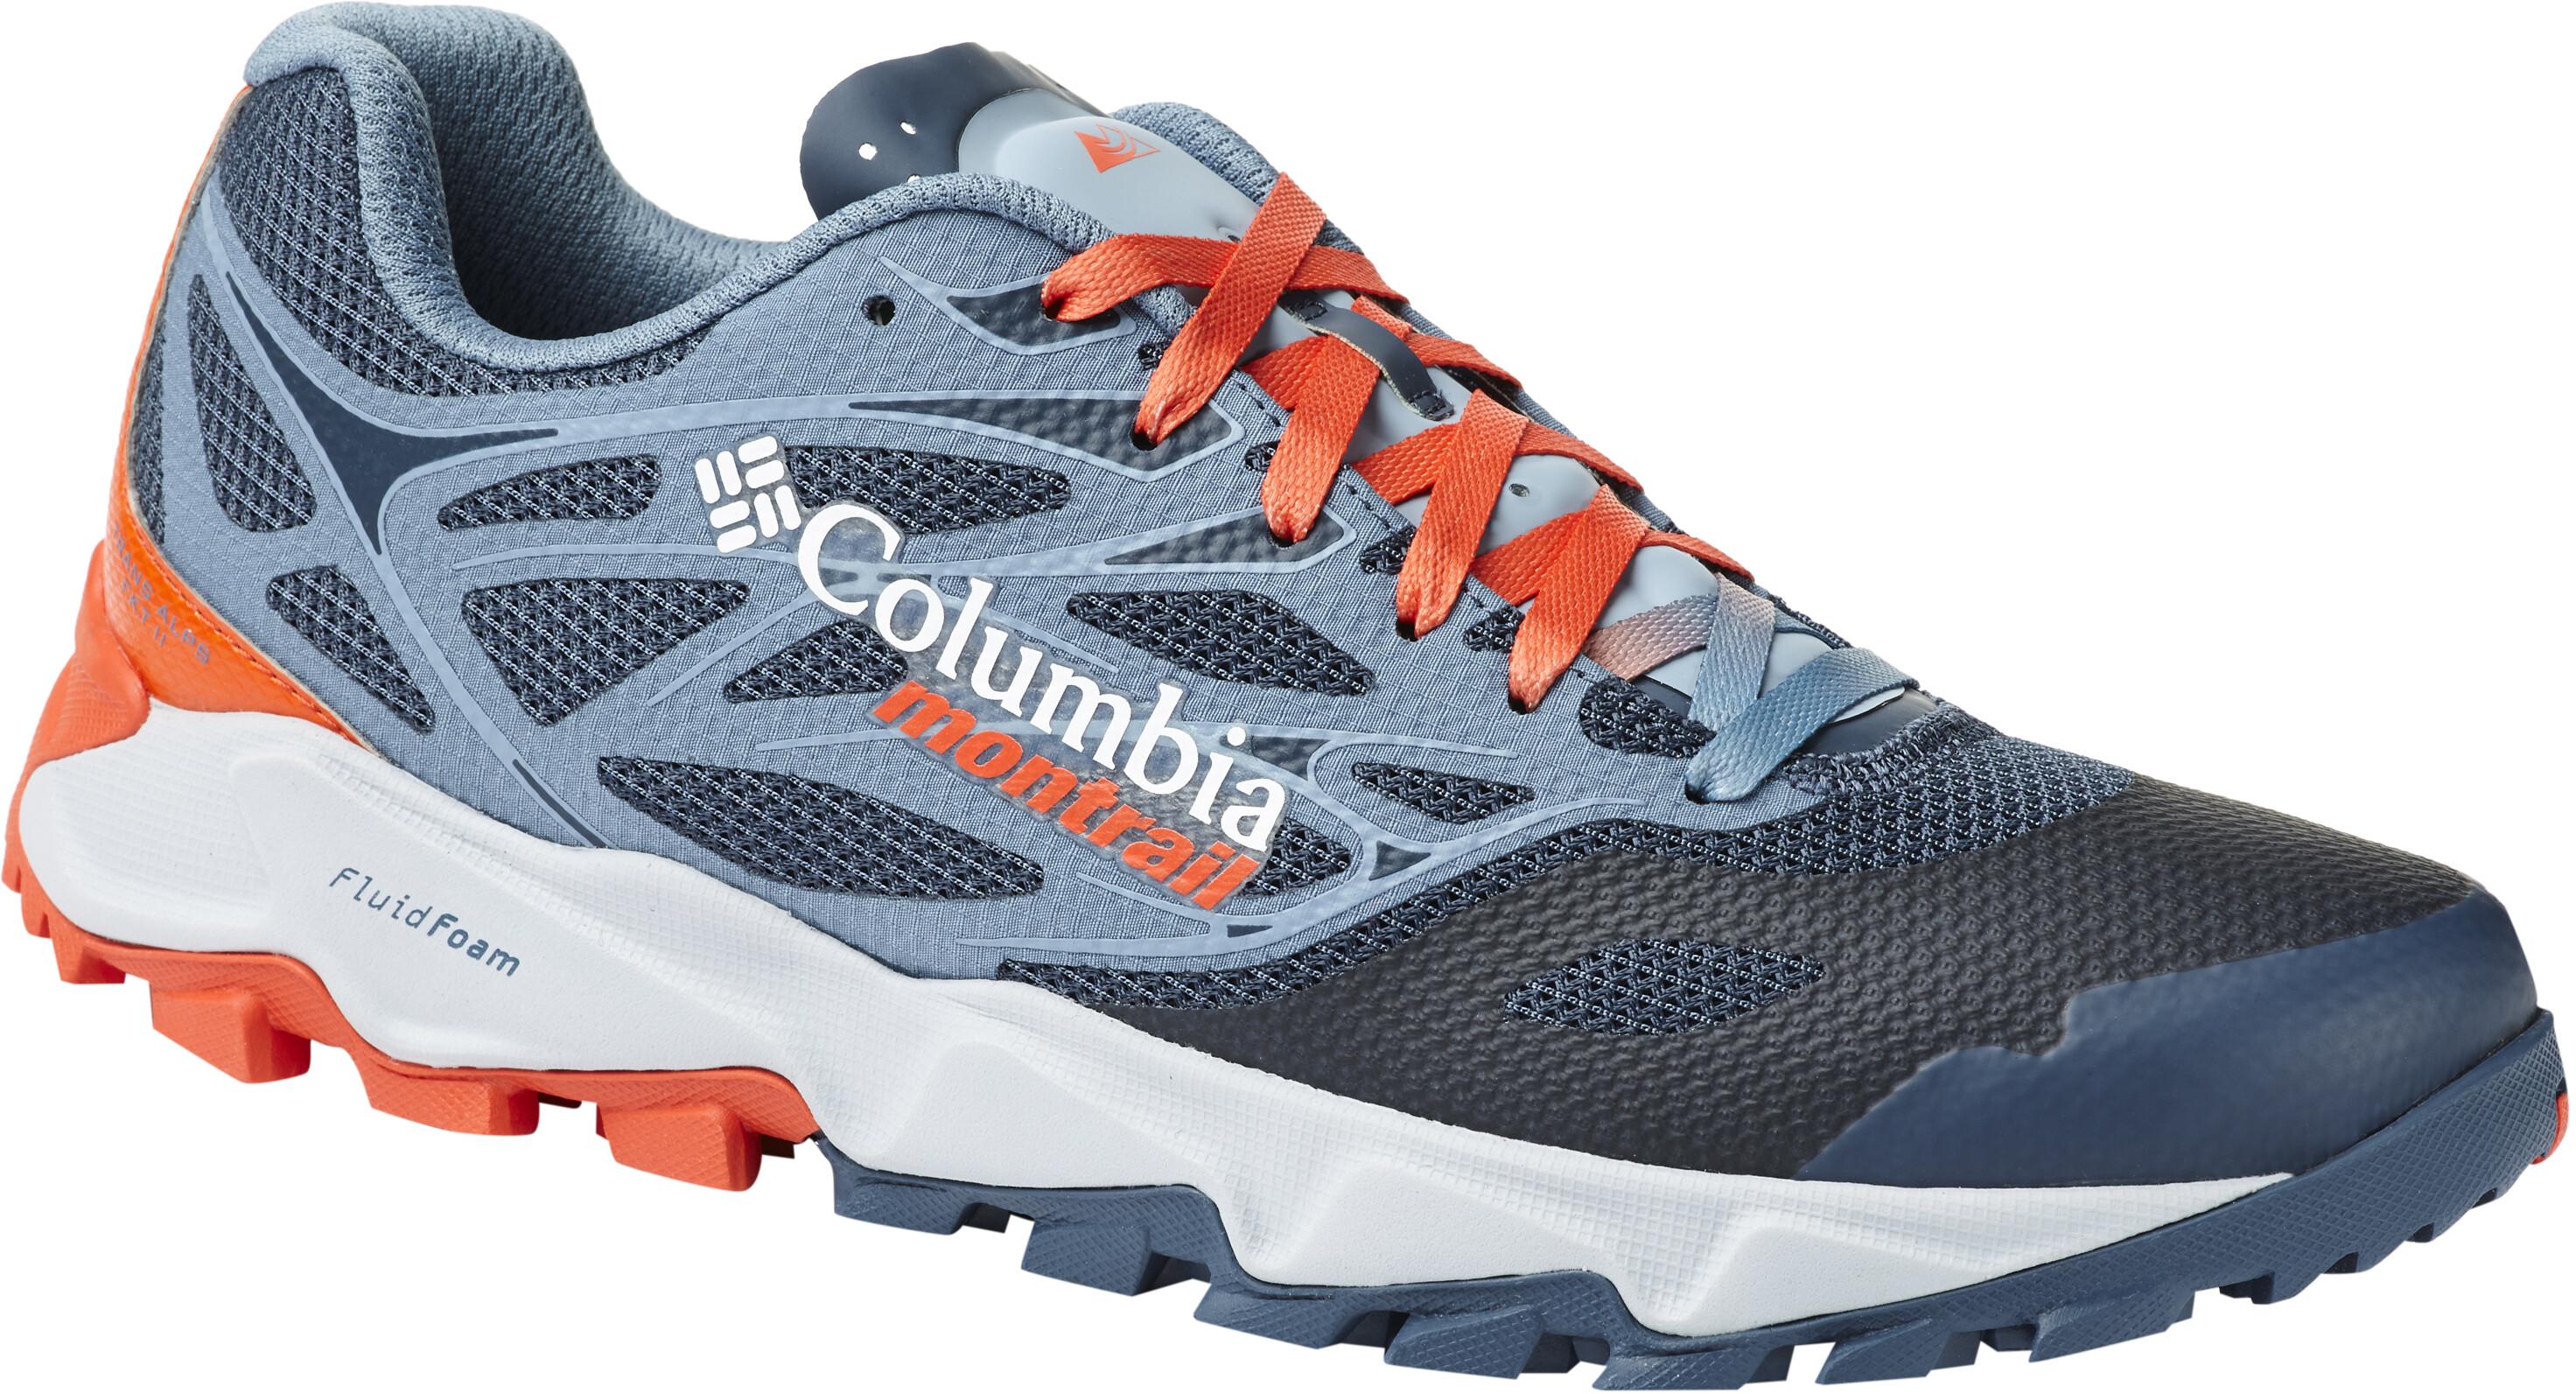 34d3eb86a99 Columbia Trans Alps F.K.T. II Hardloopschoenen Heren oranje/blauw I ...